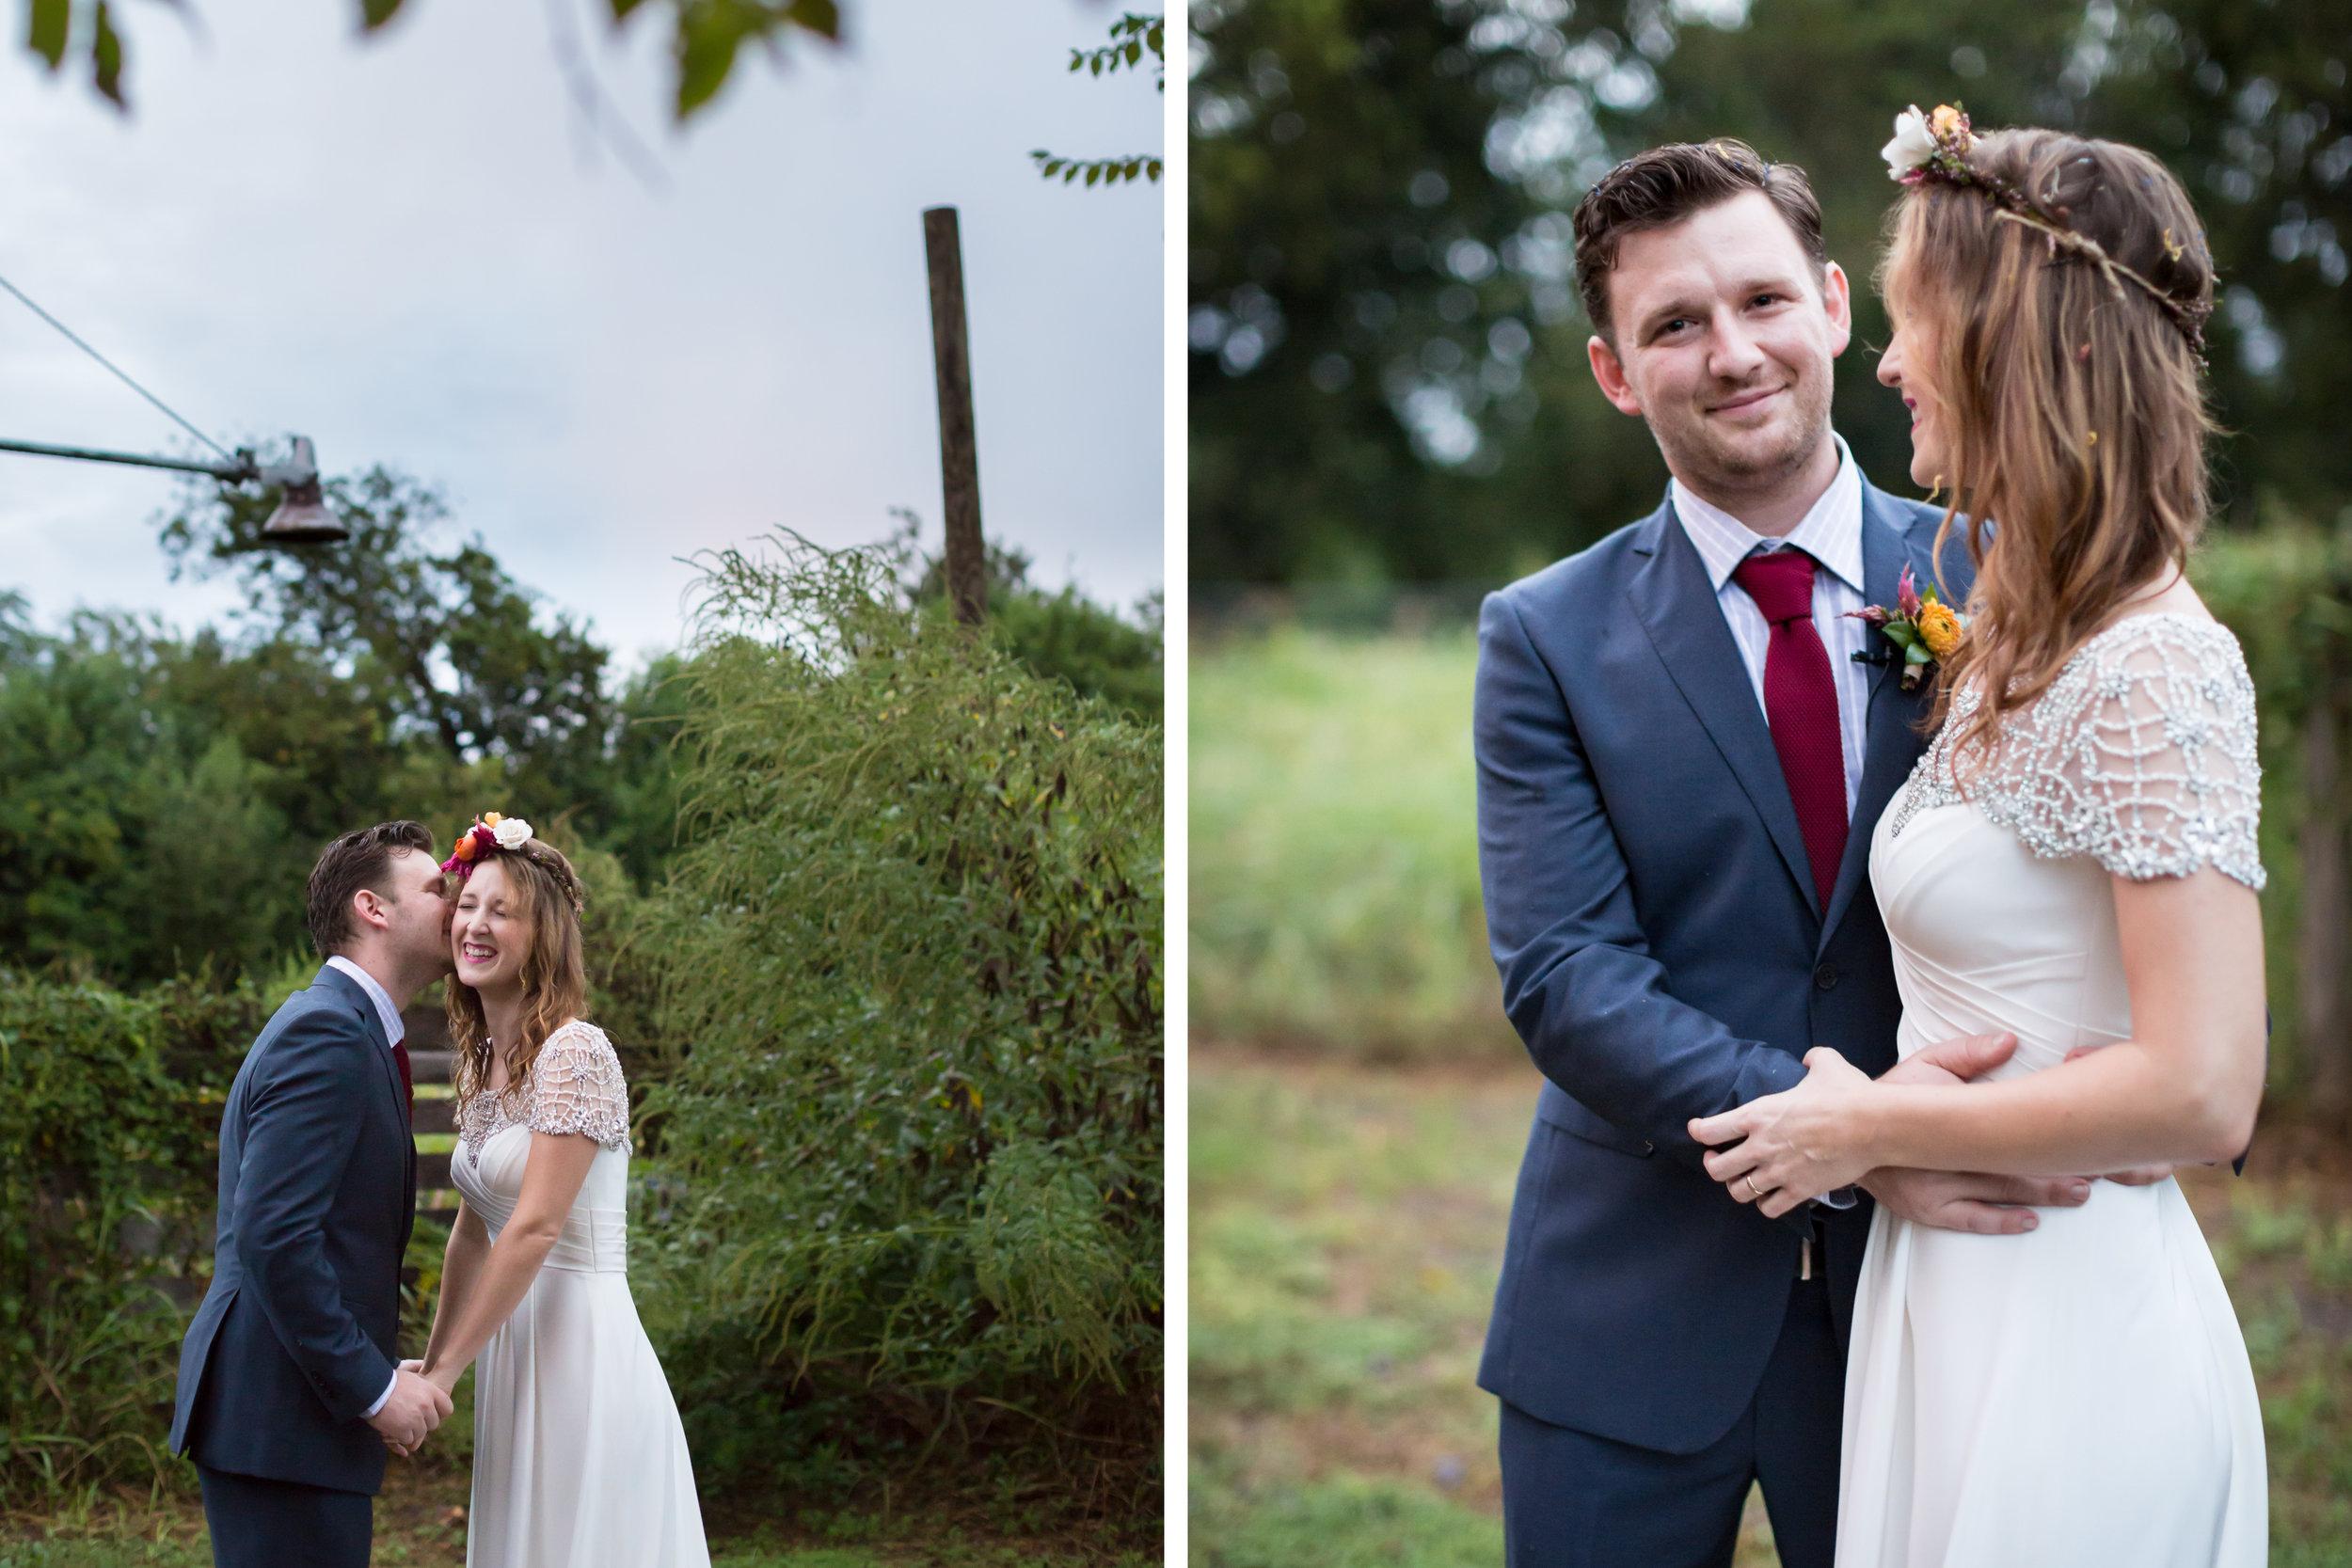 wedding-portrait-photographer-texas.jpg